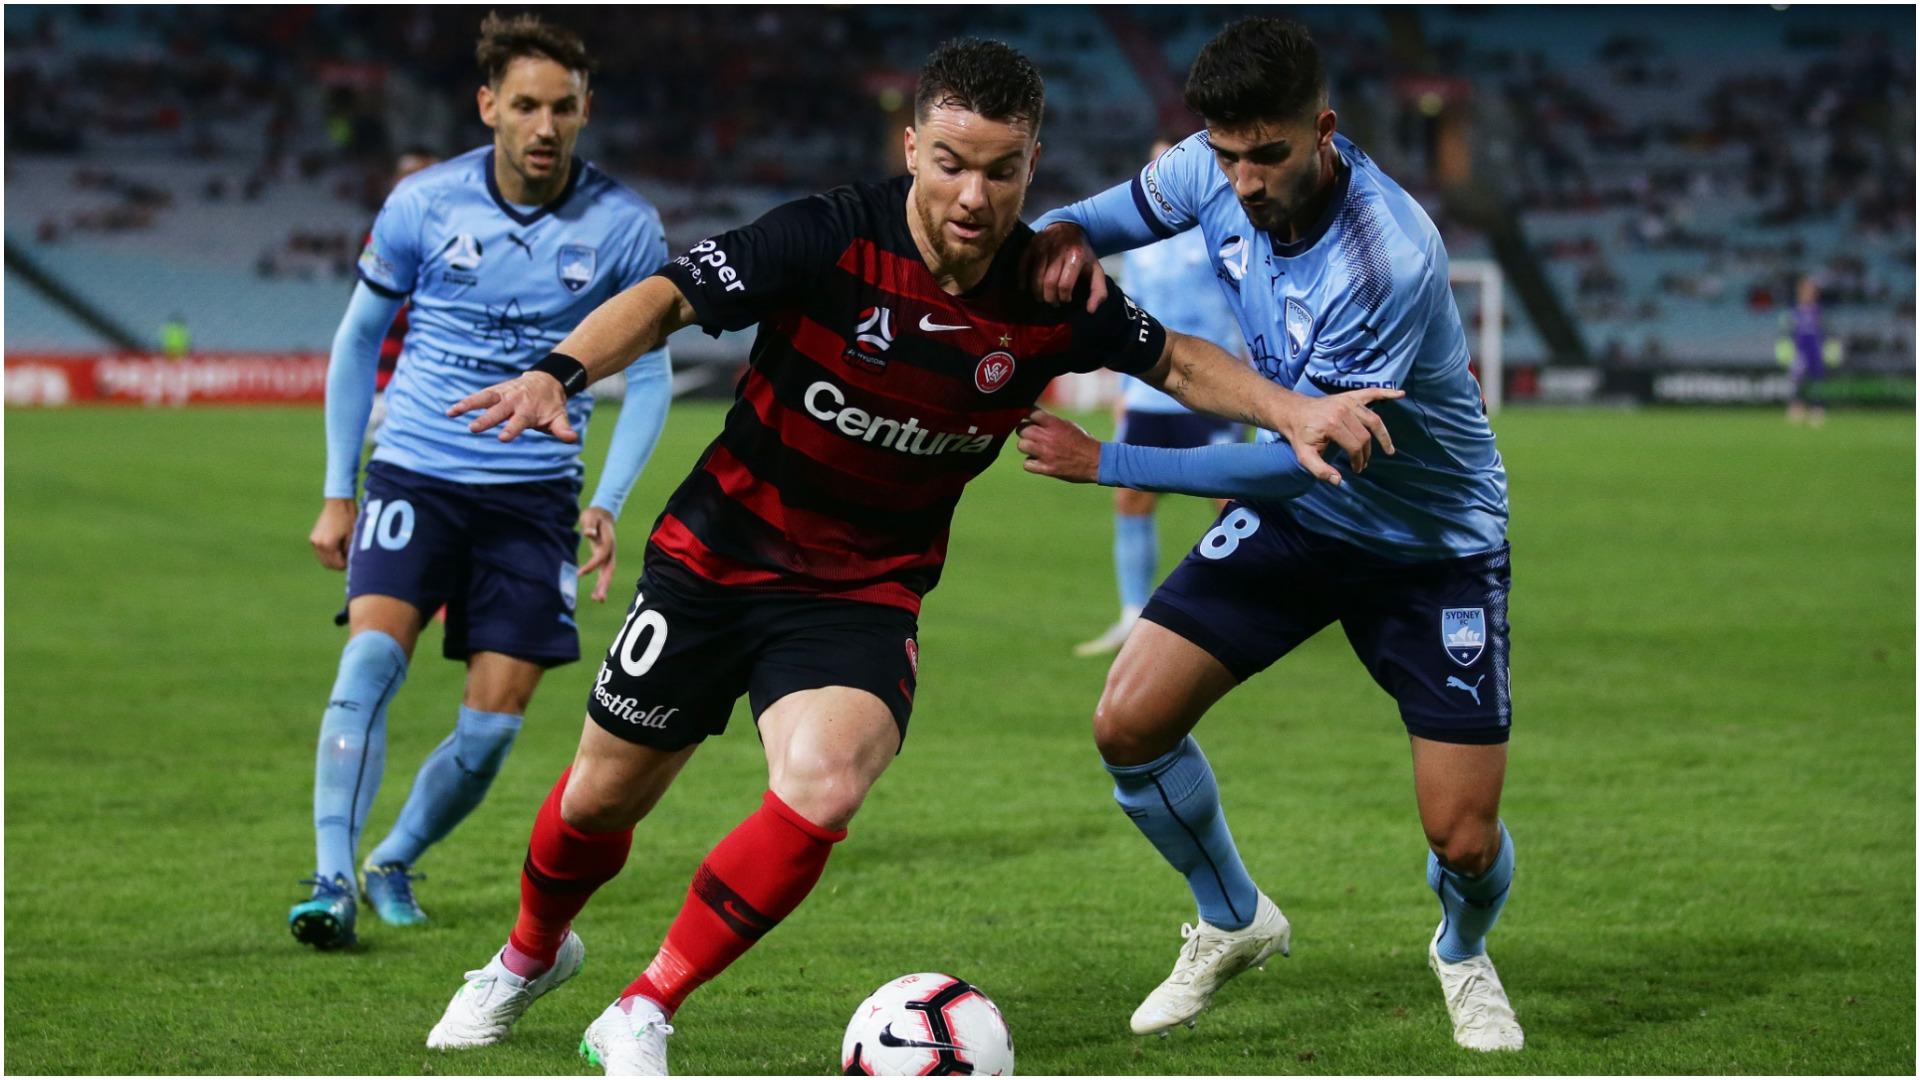 Perth on brink of premiership glory after Sydney draw